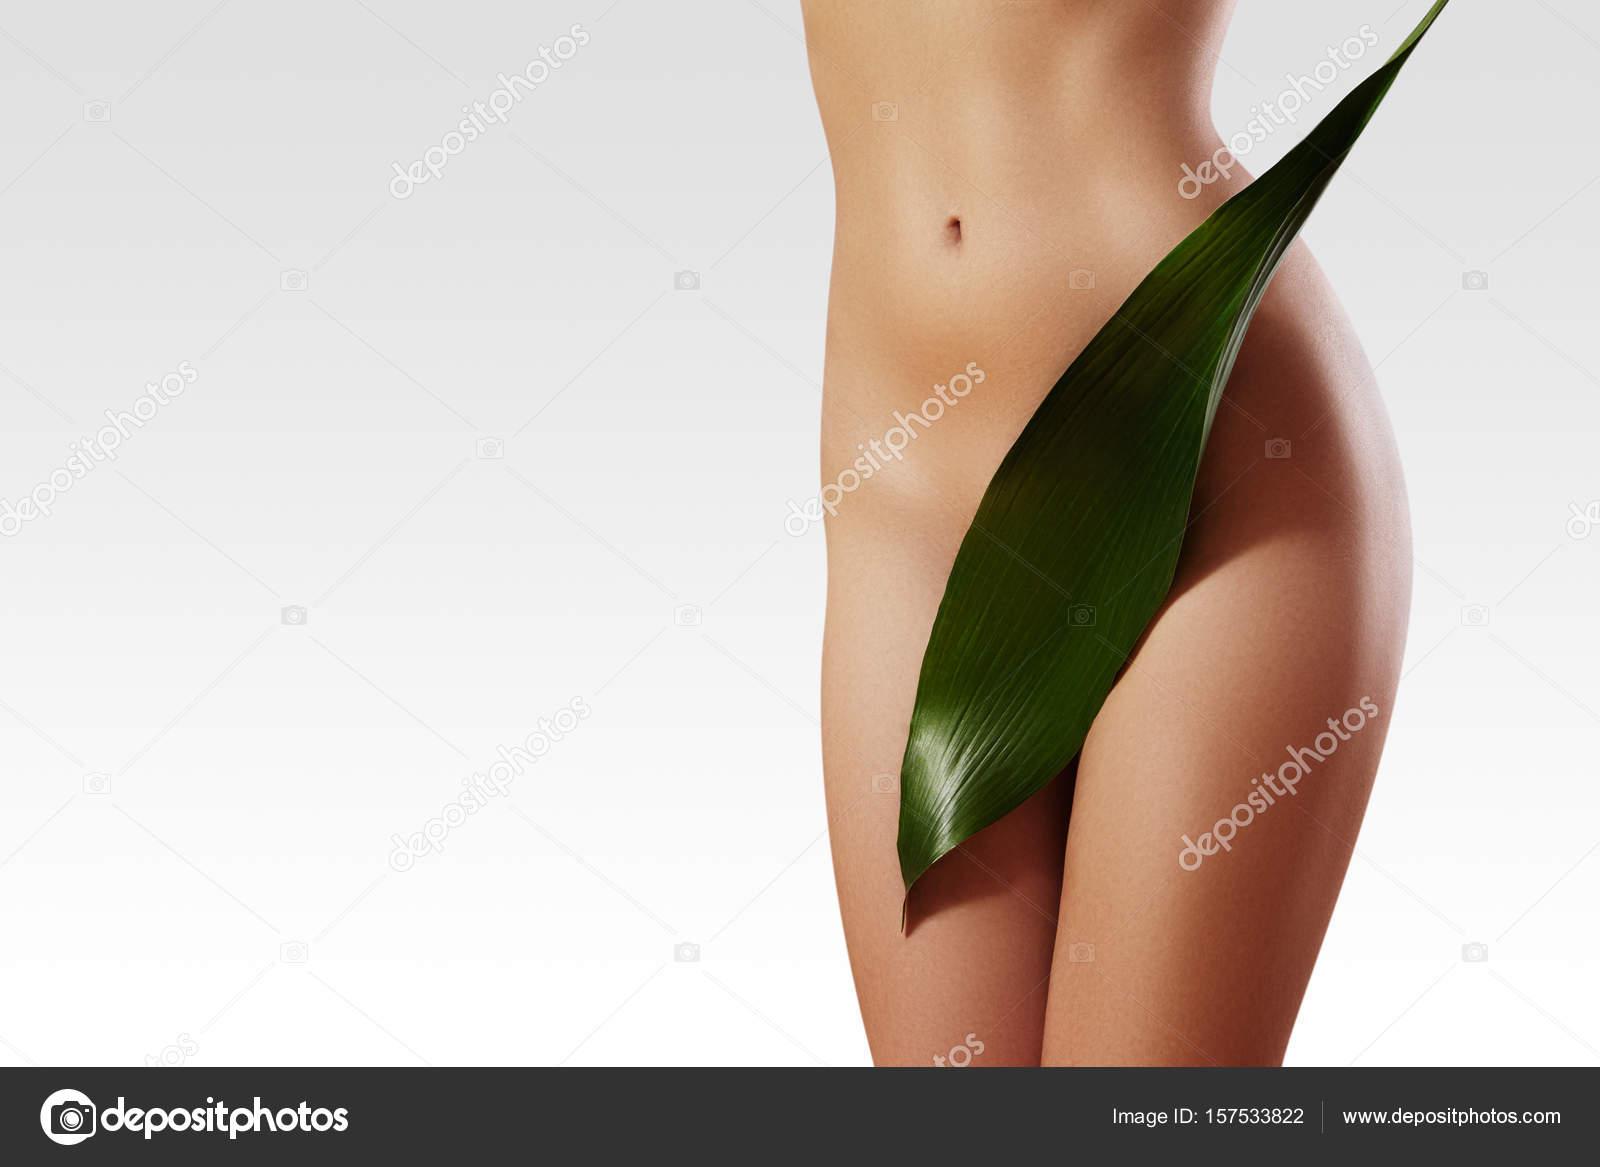 Brazilian bikini wax jpg